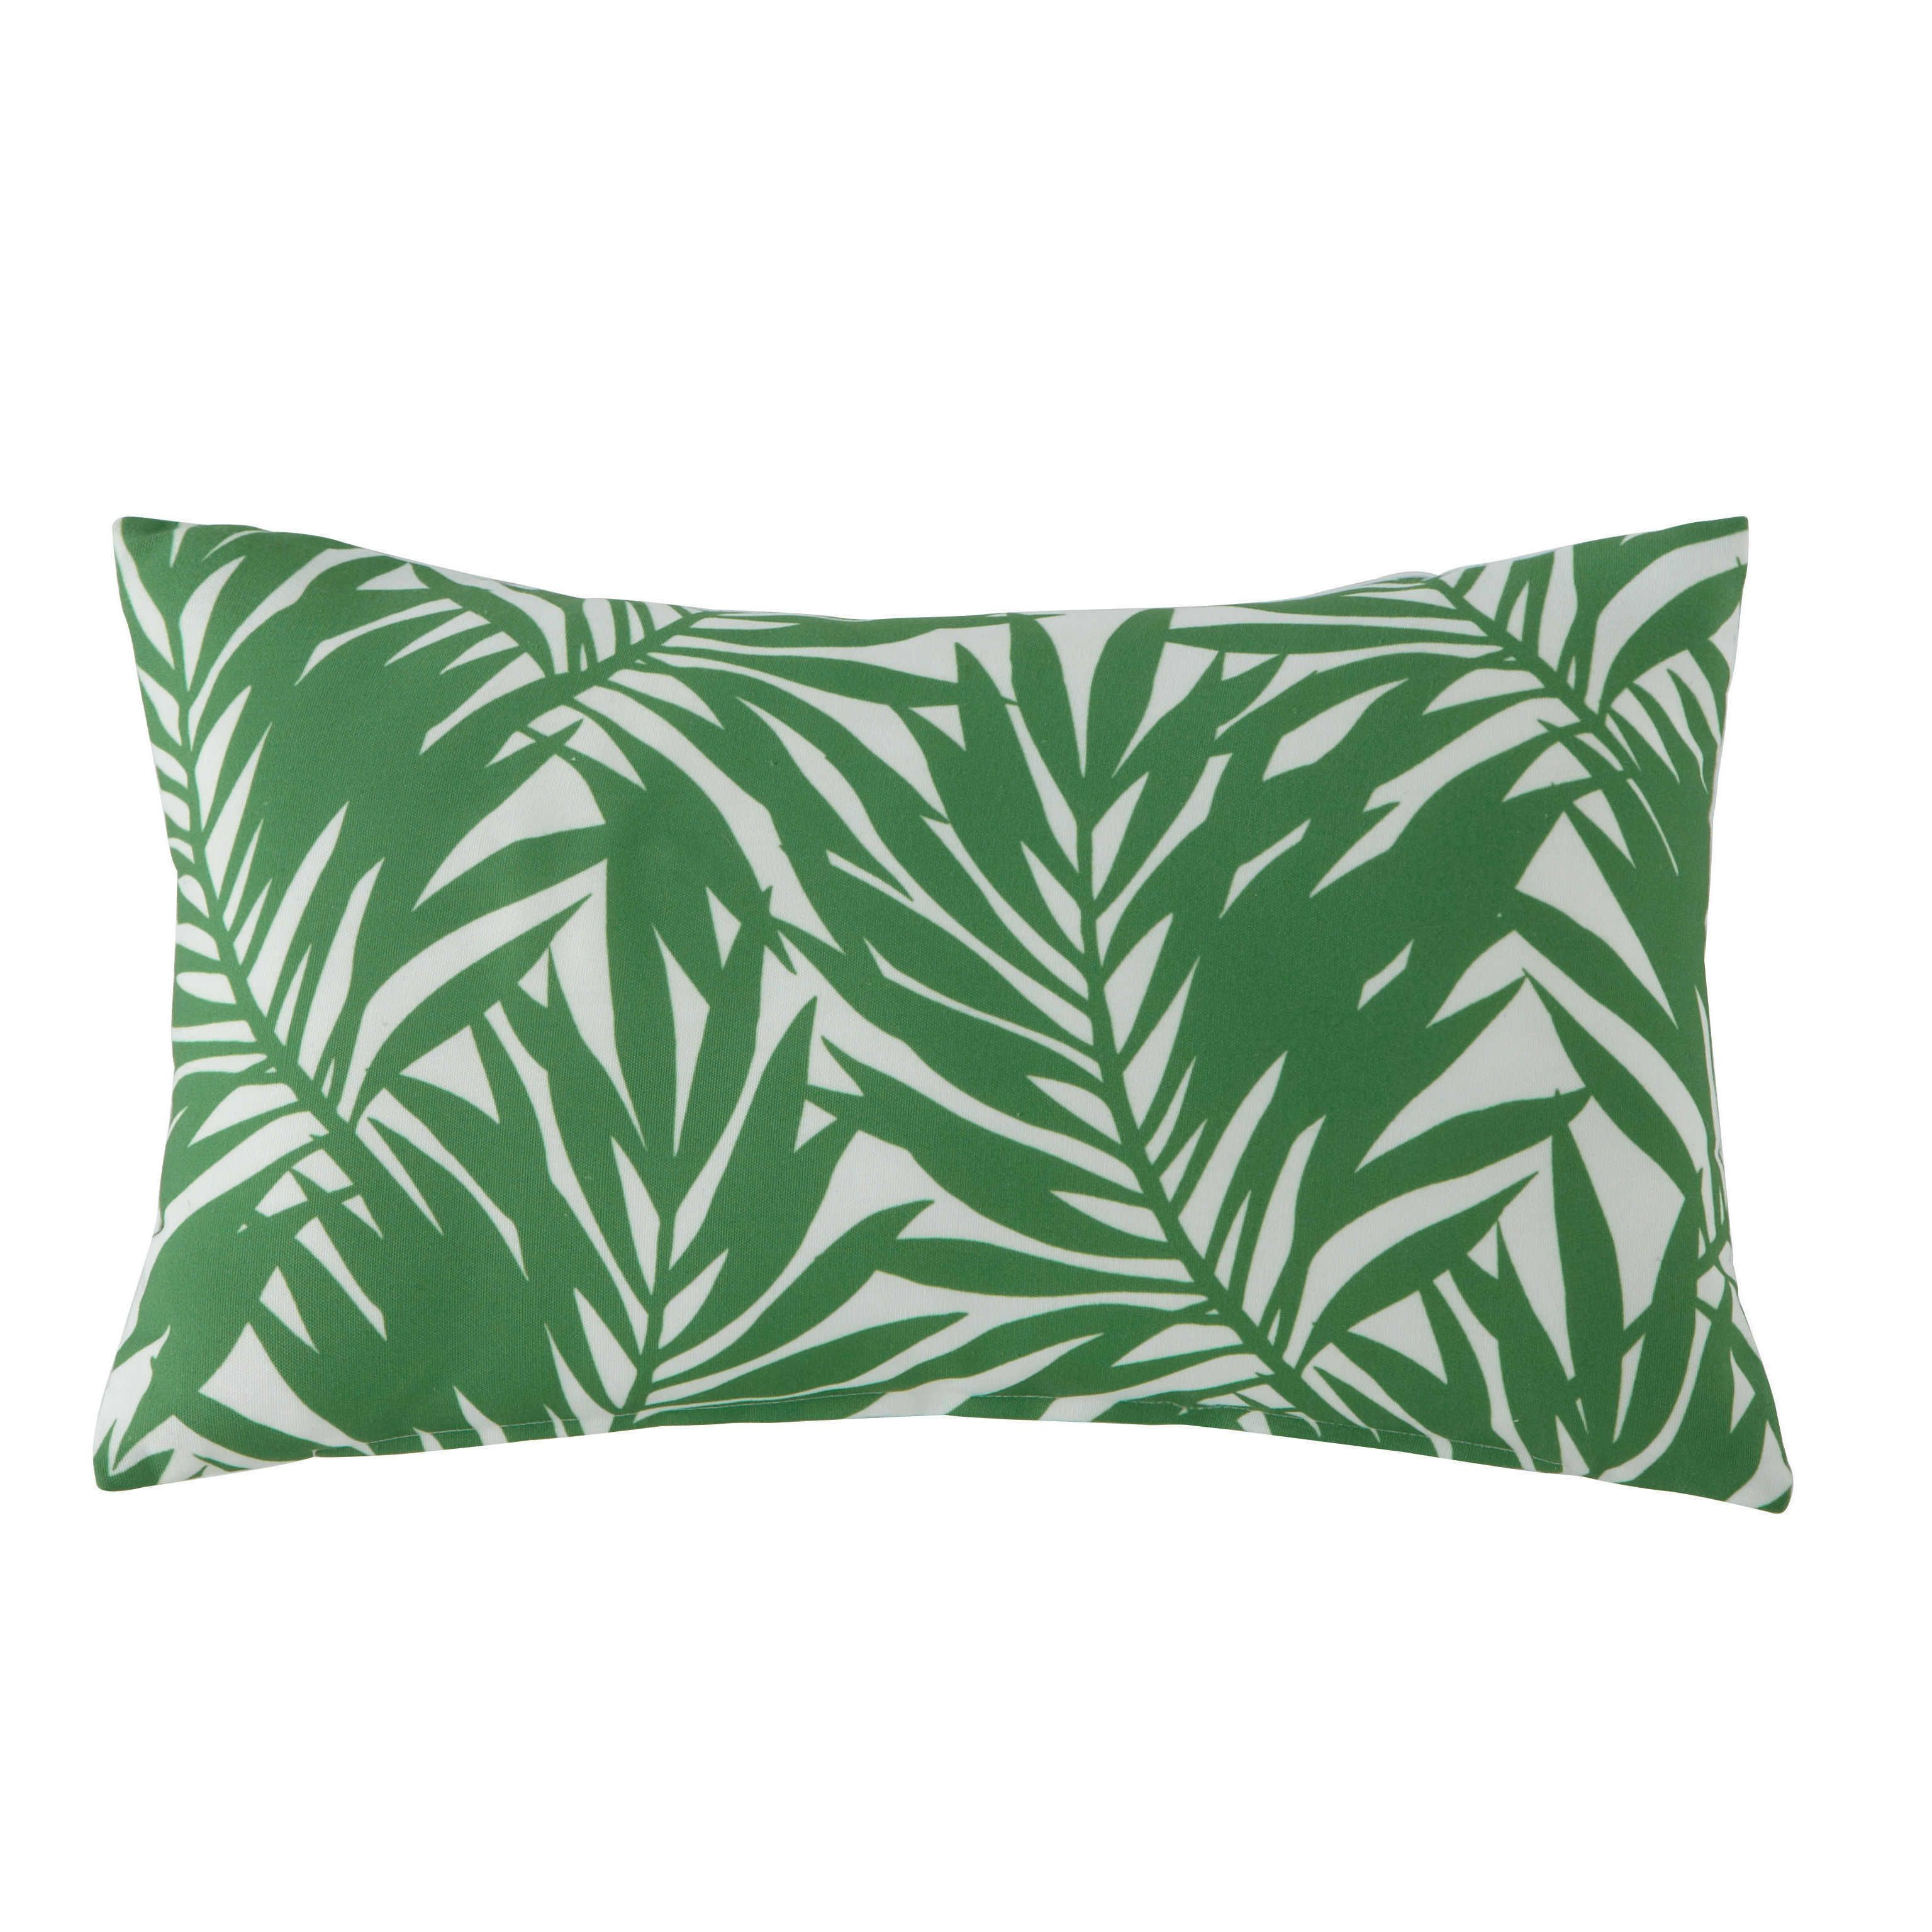 Outdoor Kissen Caryota Mit Pflanzenmotiv Bedruckt 30 X 50 Cm